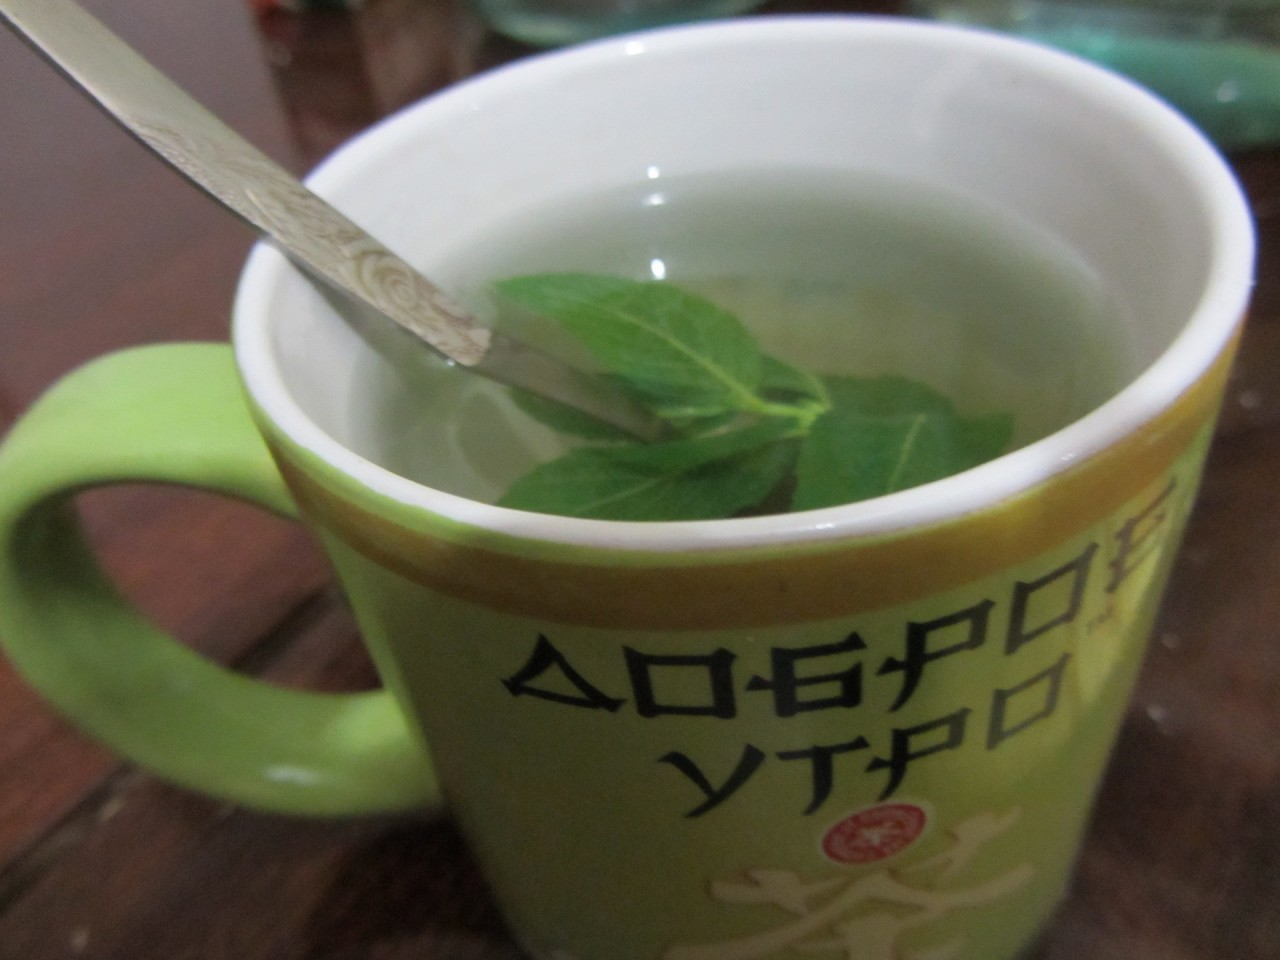 O chá hortelã revigora ou acalma, Chá de hortelã é benéfico ou prejudicial para a saúde masculina, Chá de hortelã para a perda de peso